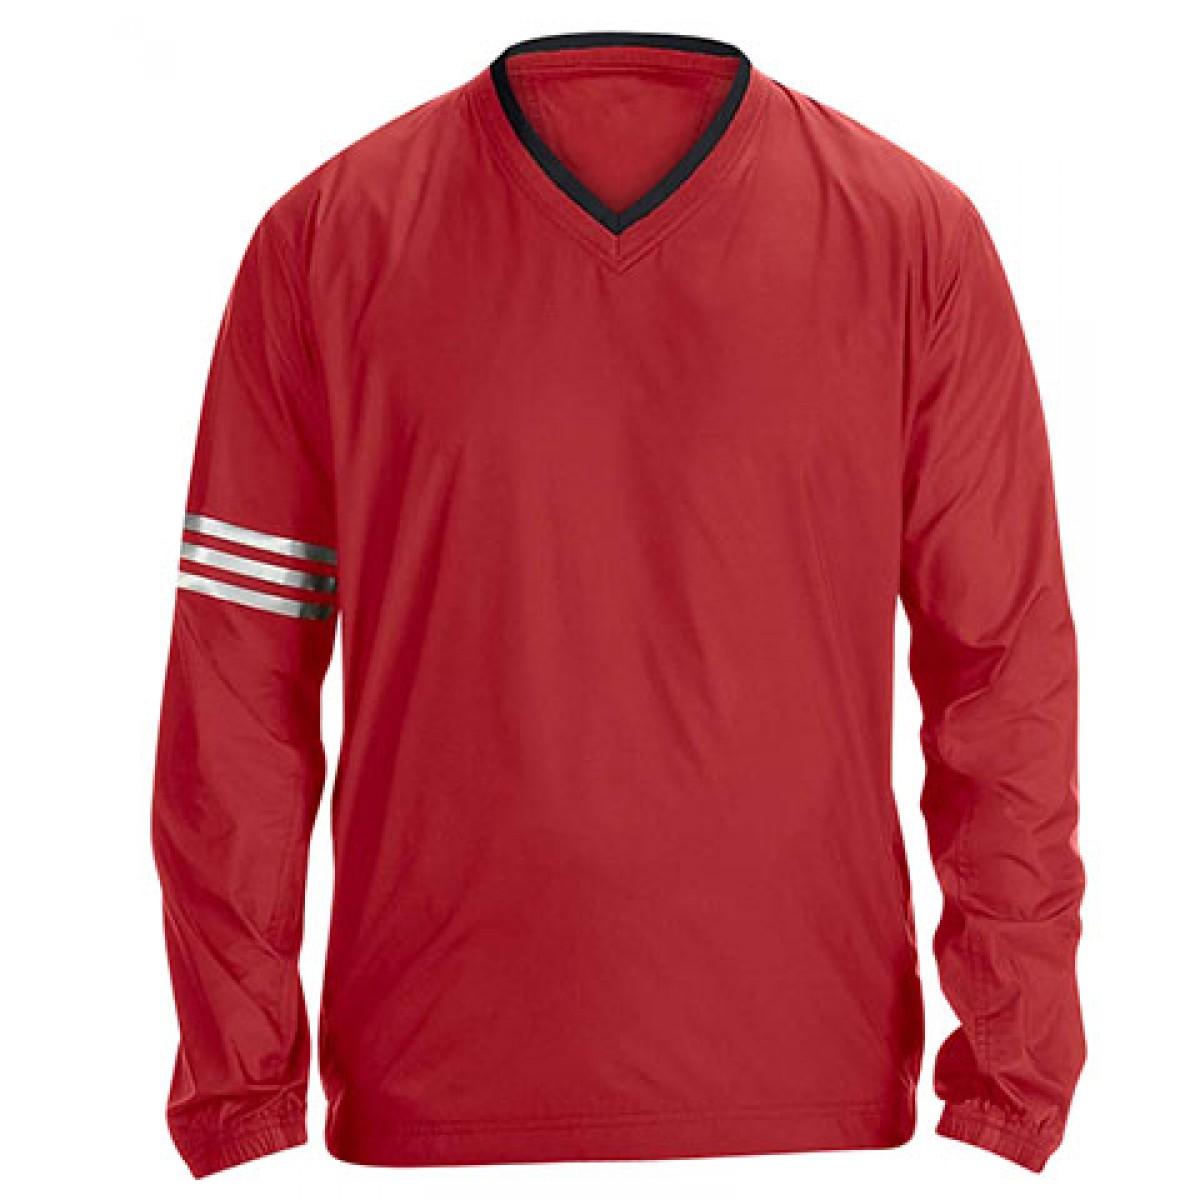 Adidas ClimaLite V-Neck Long Sleeve Wind Shirt-Red-2XL